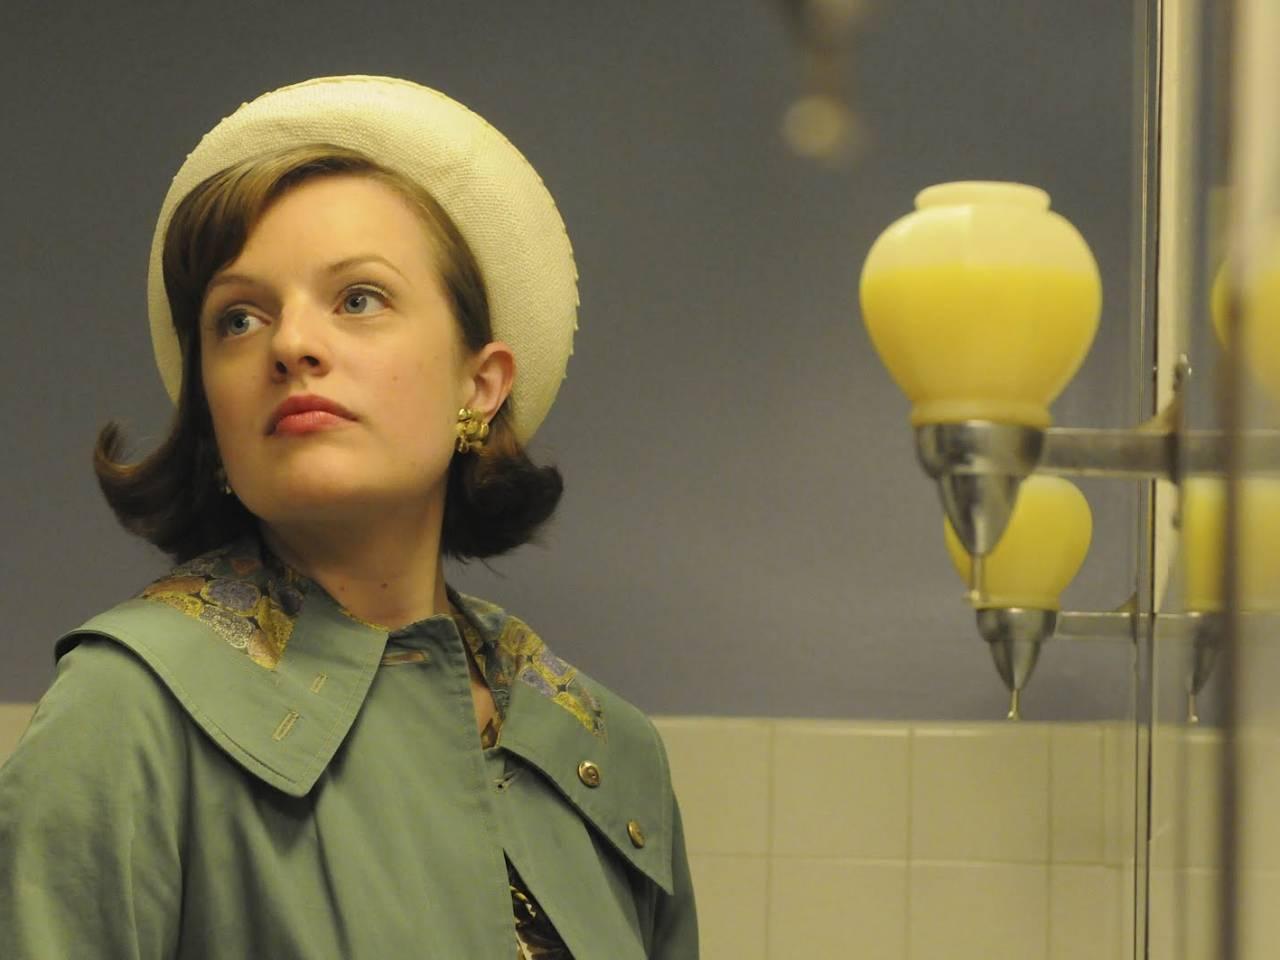 Elisabeth Moss protagonista della distopica serie The Handmaid's Tale